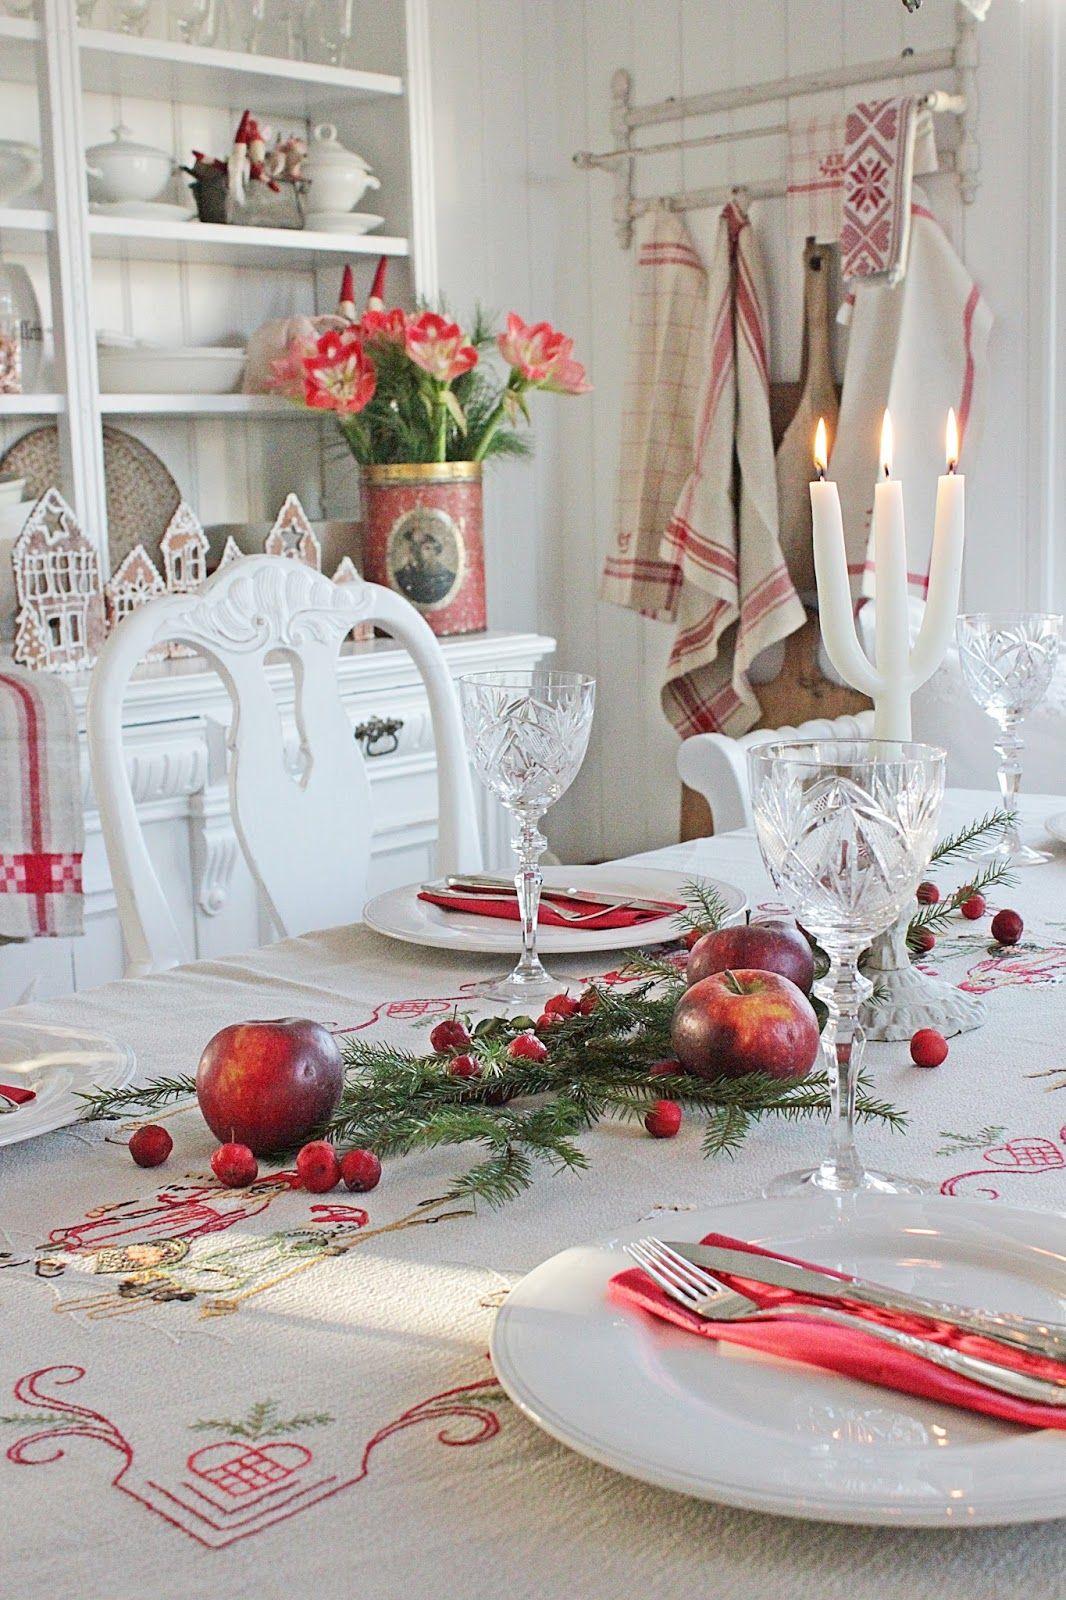 Scandinavian Christmas Tablescape Christmas Table Settings Country Christmas Decorations Scandinavian Christmas Decorations